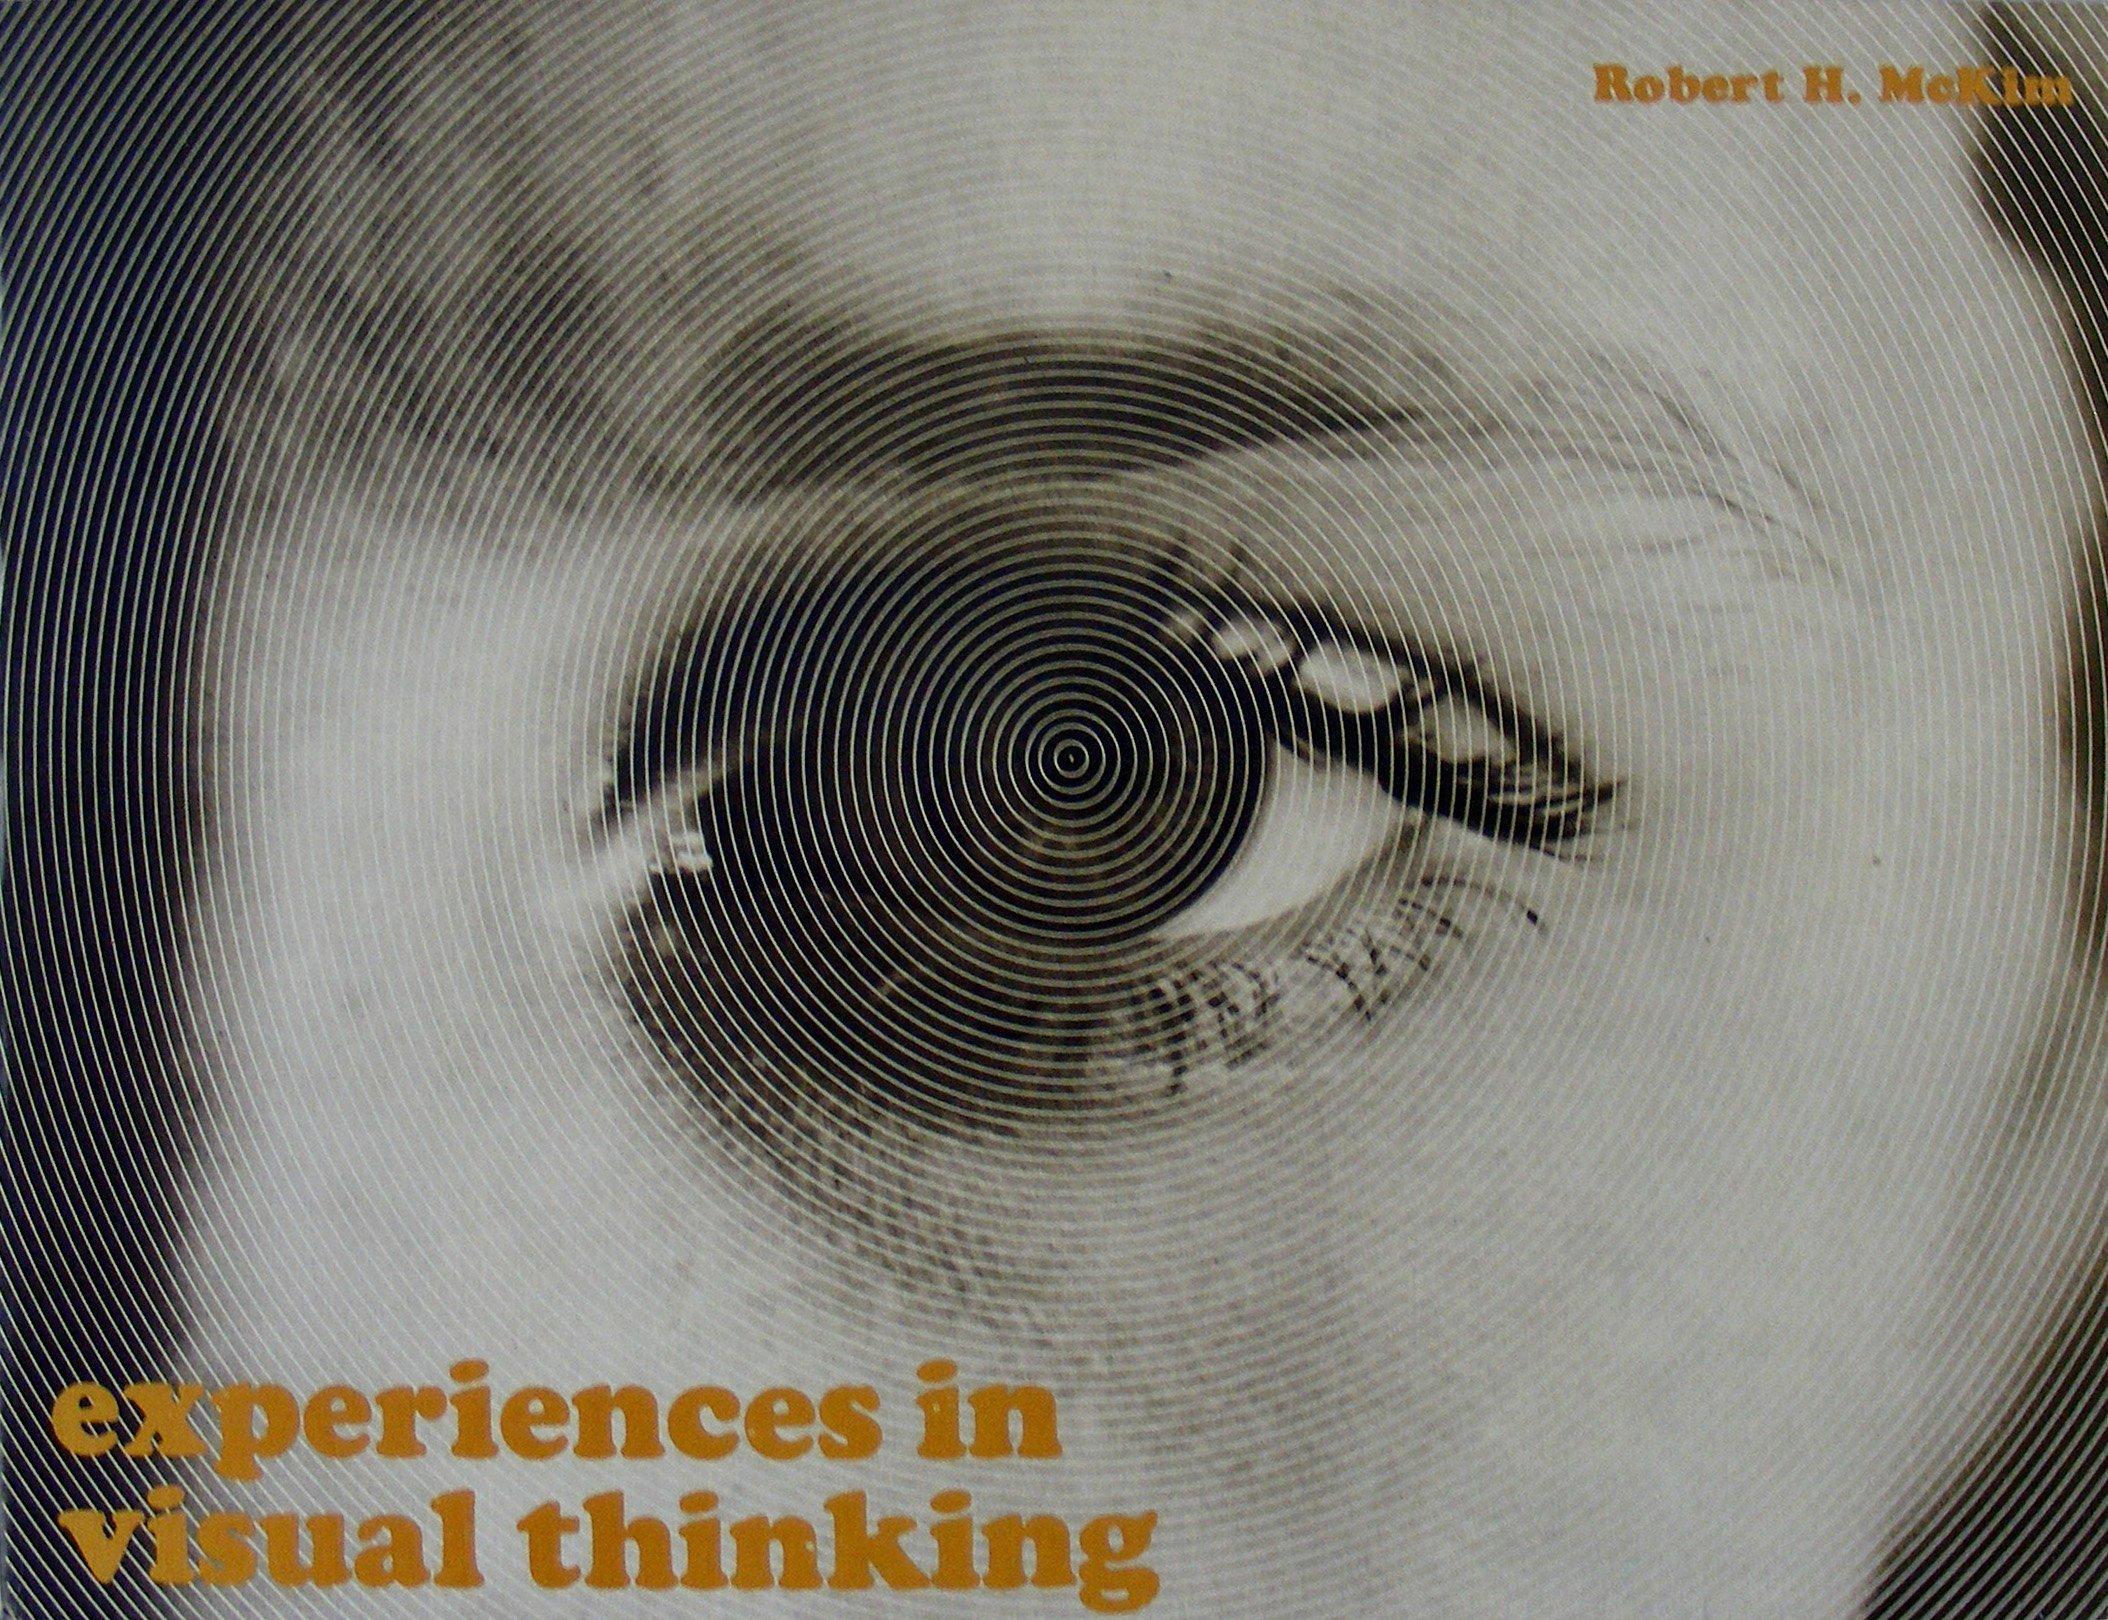 Experiences in Visual Thinking, Robert H. McKim